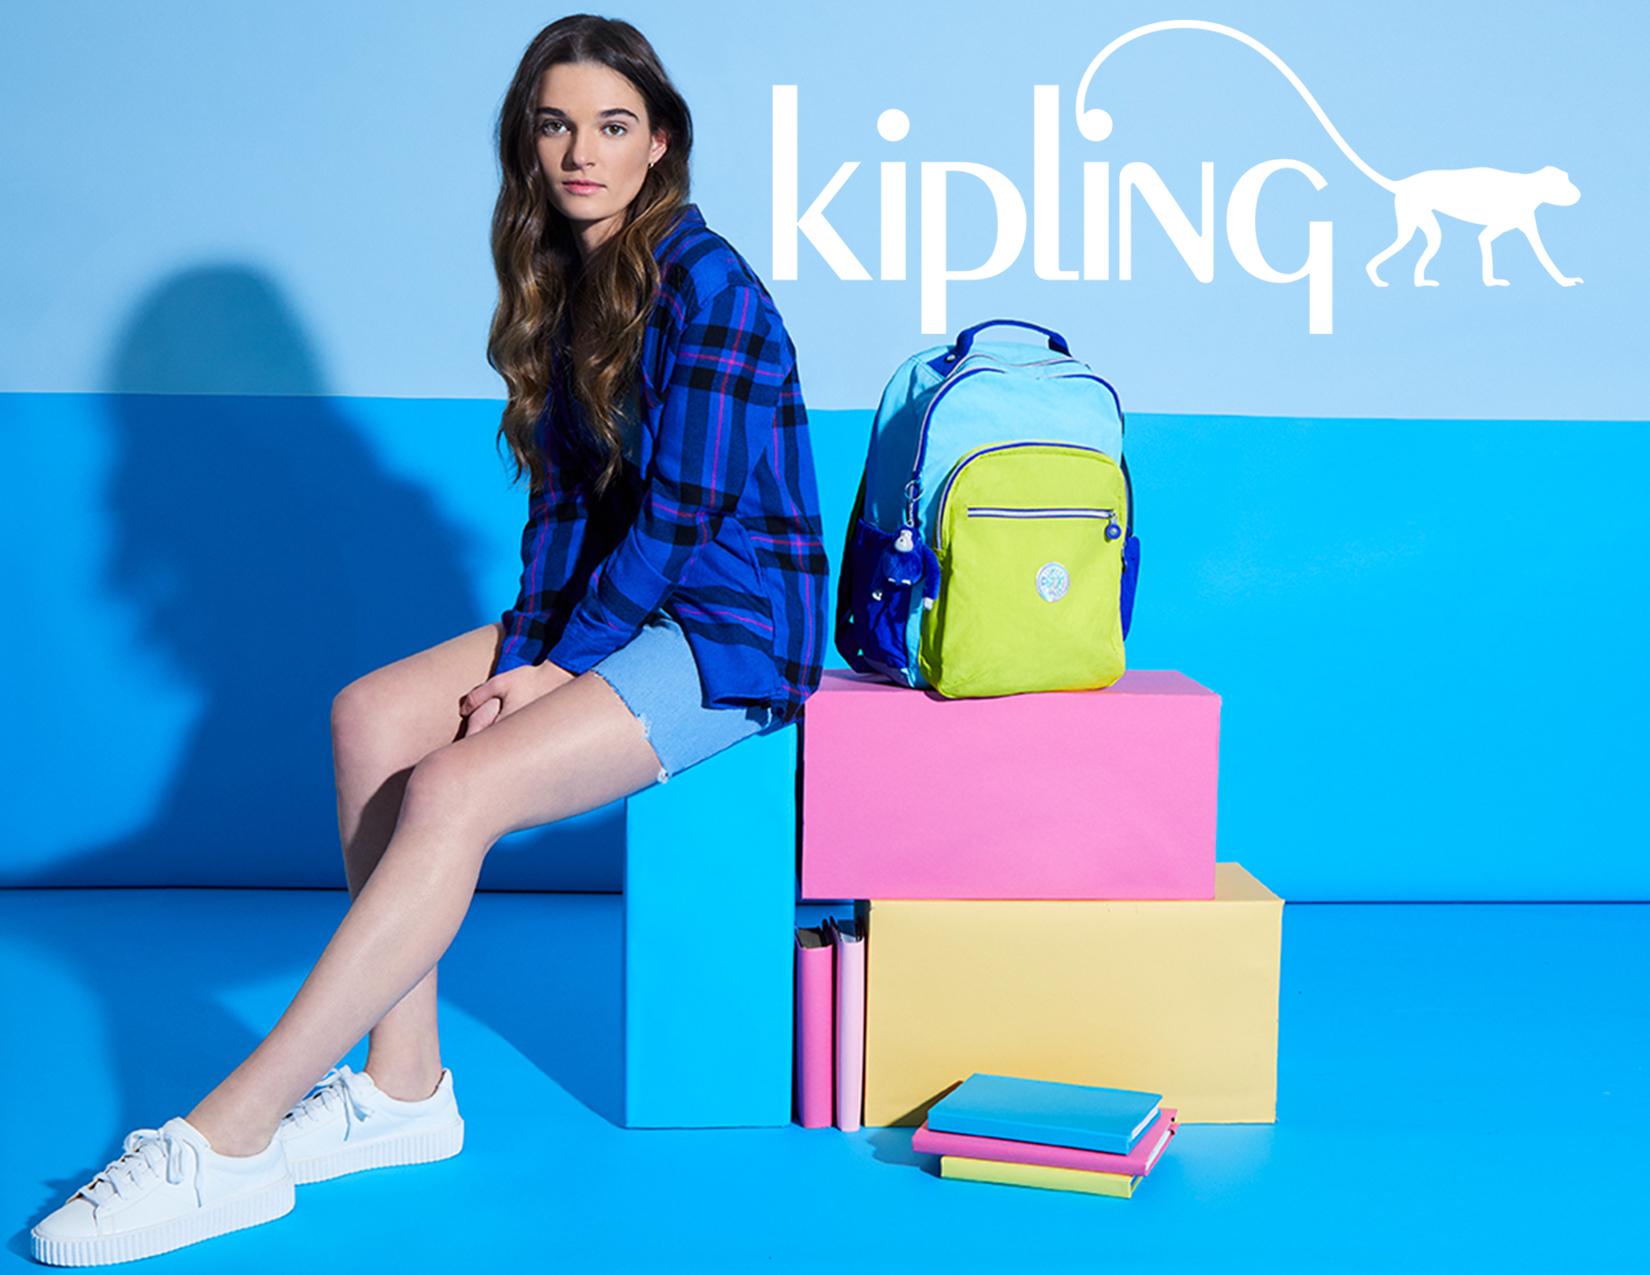 kipling Final 2